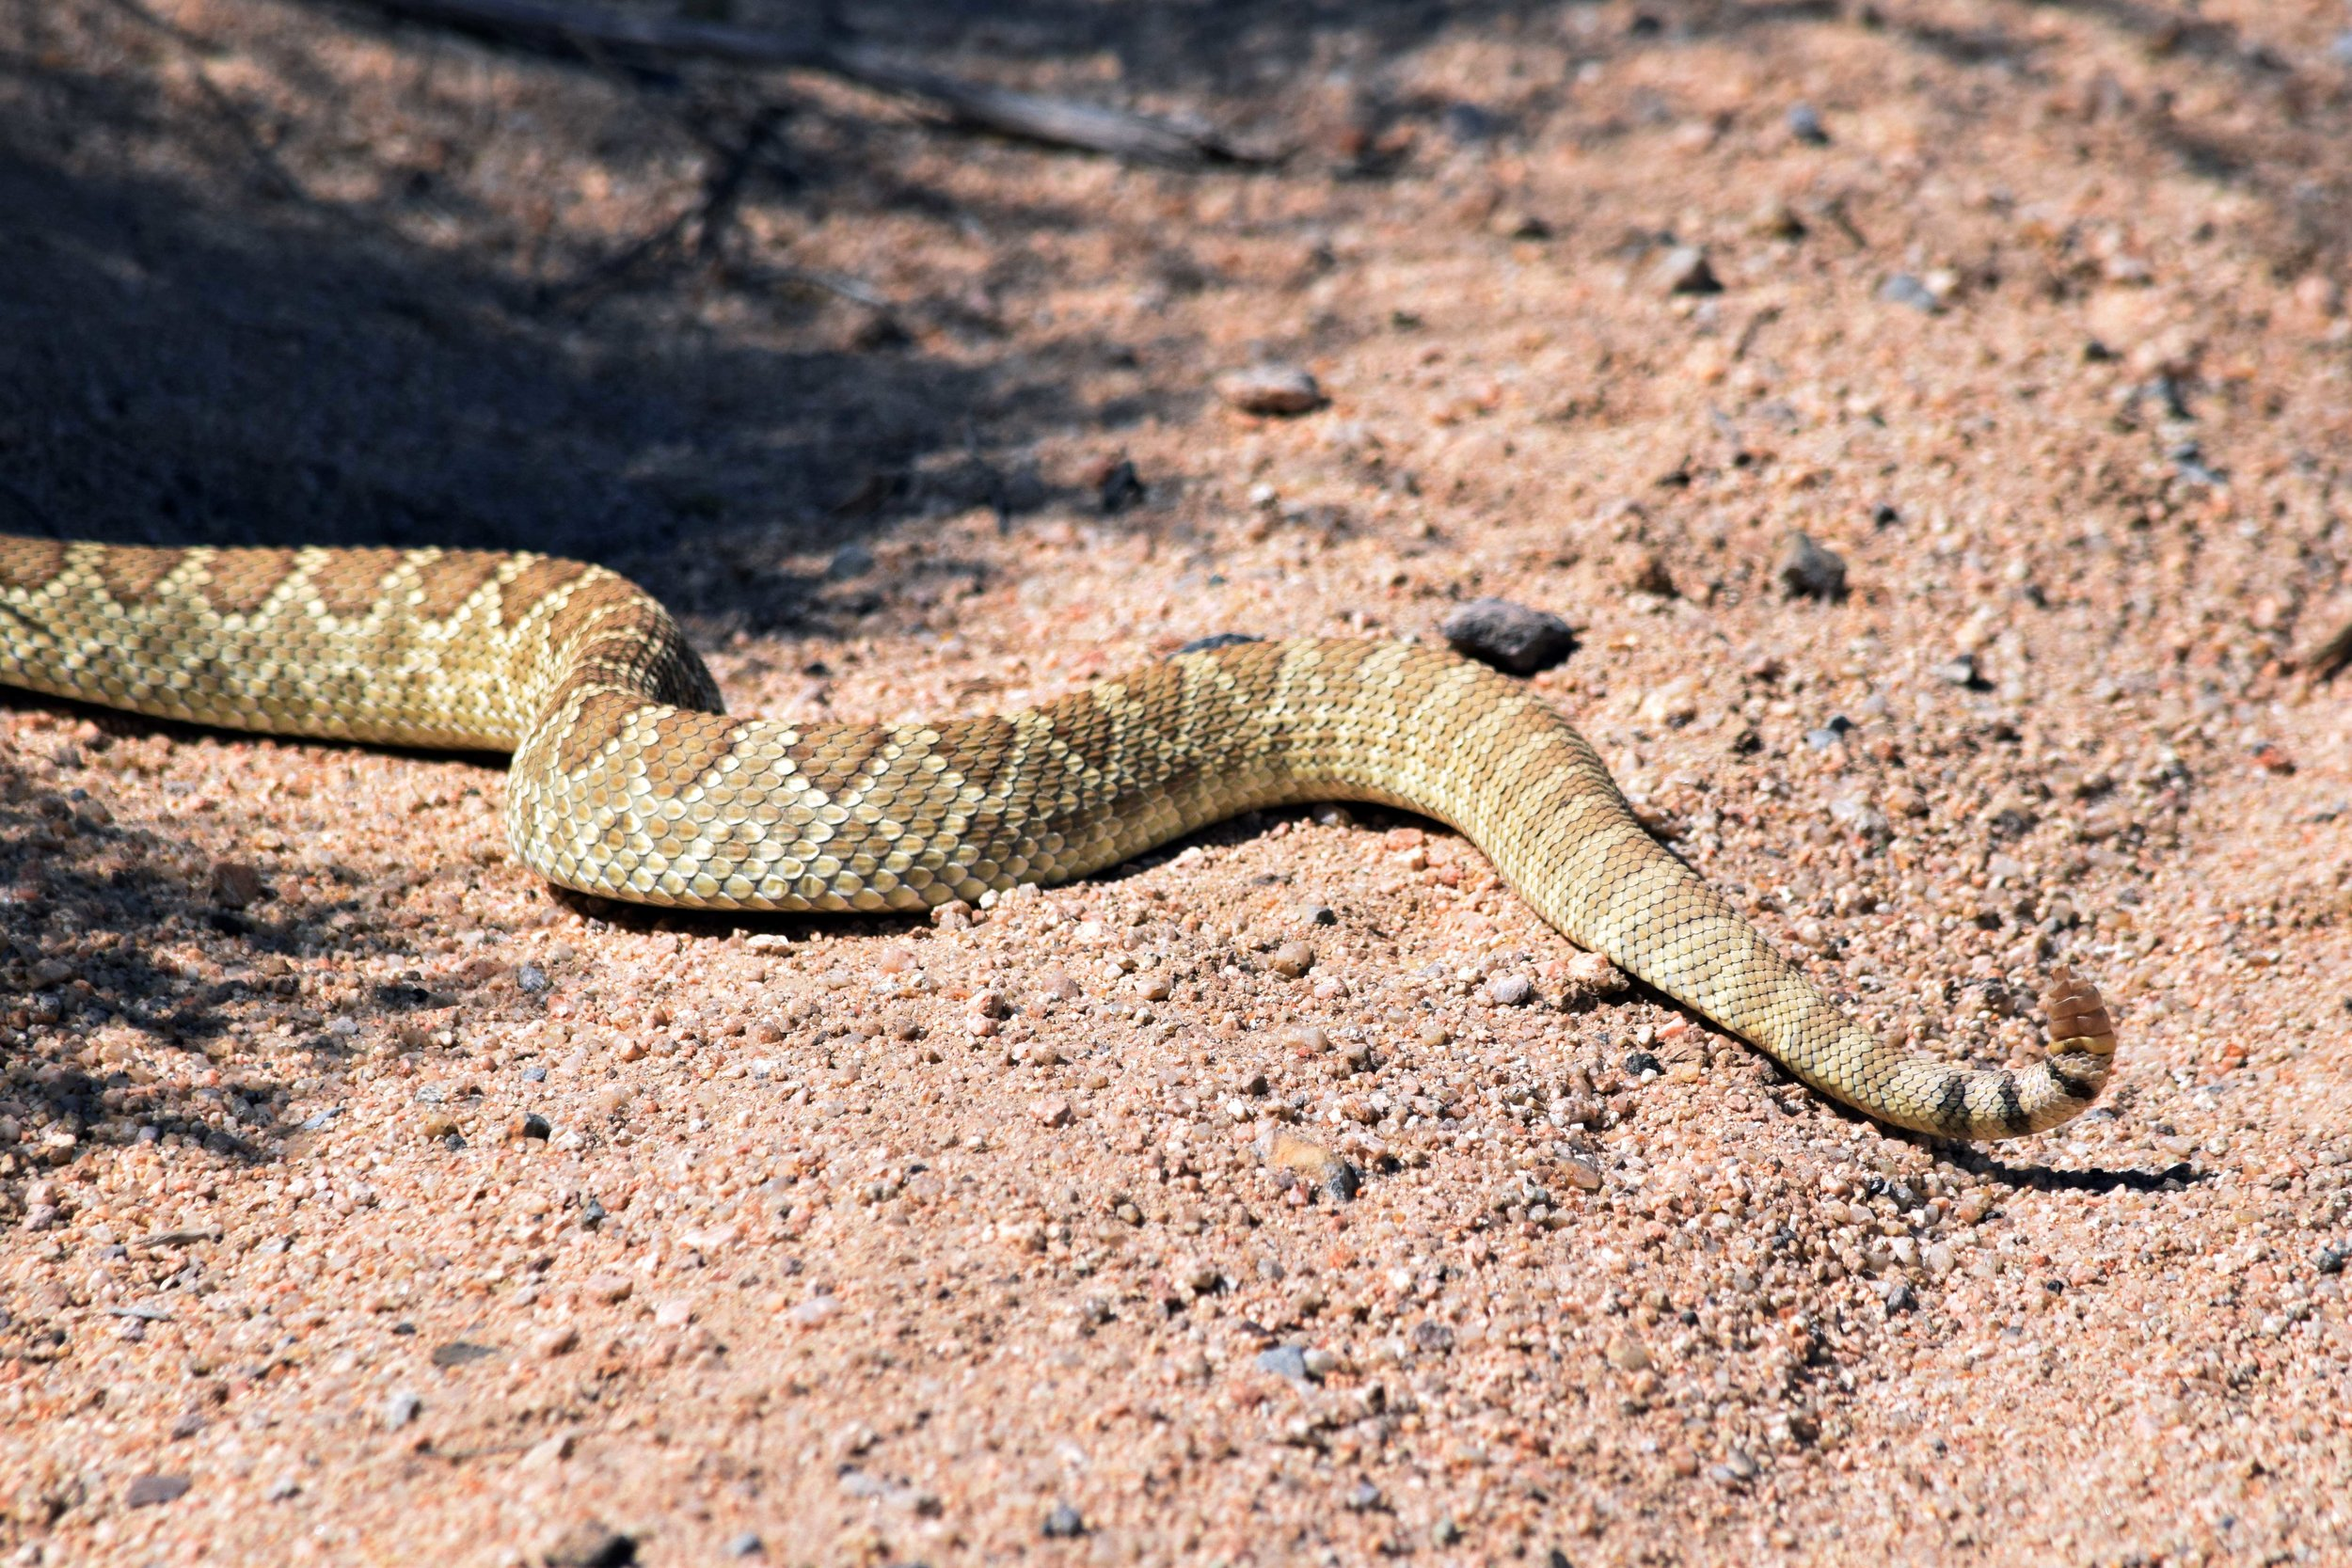 Mojave Green Rattlesnake - Photo by Tim Giller